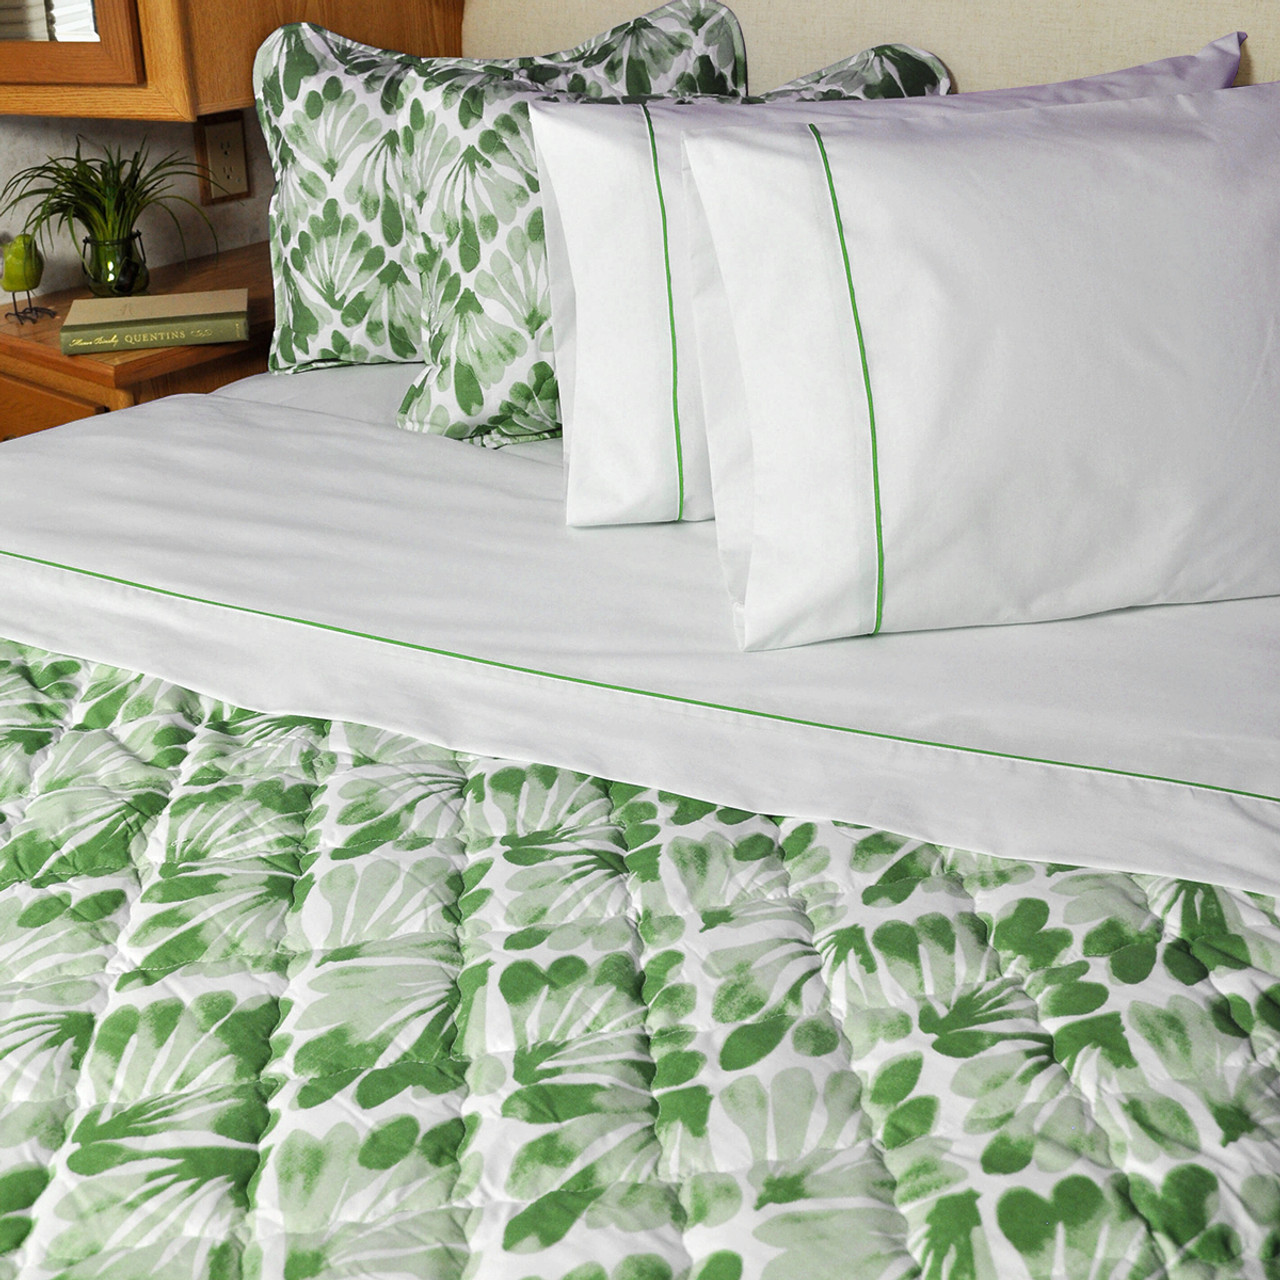 Bedspreads.Key West 3 Piece Bedspread Set